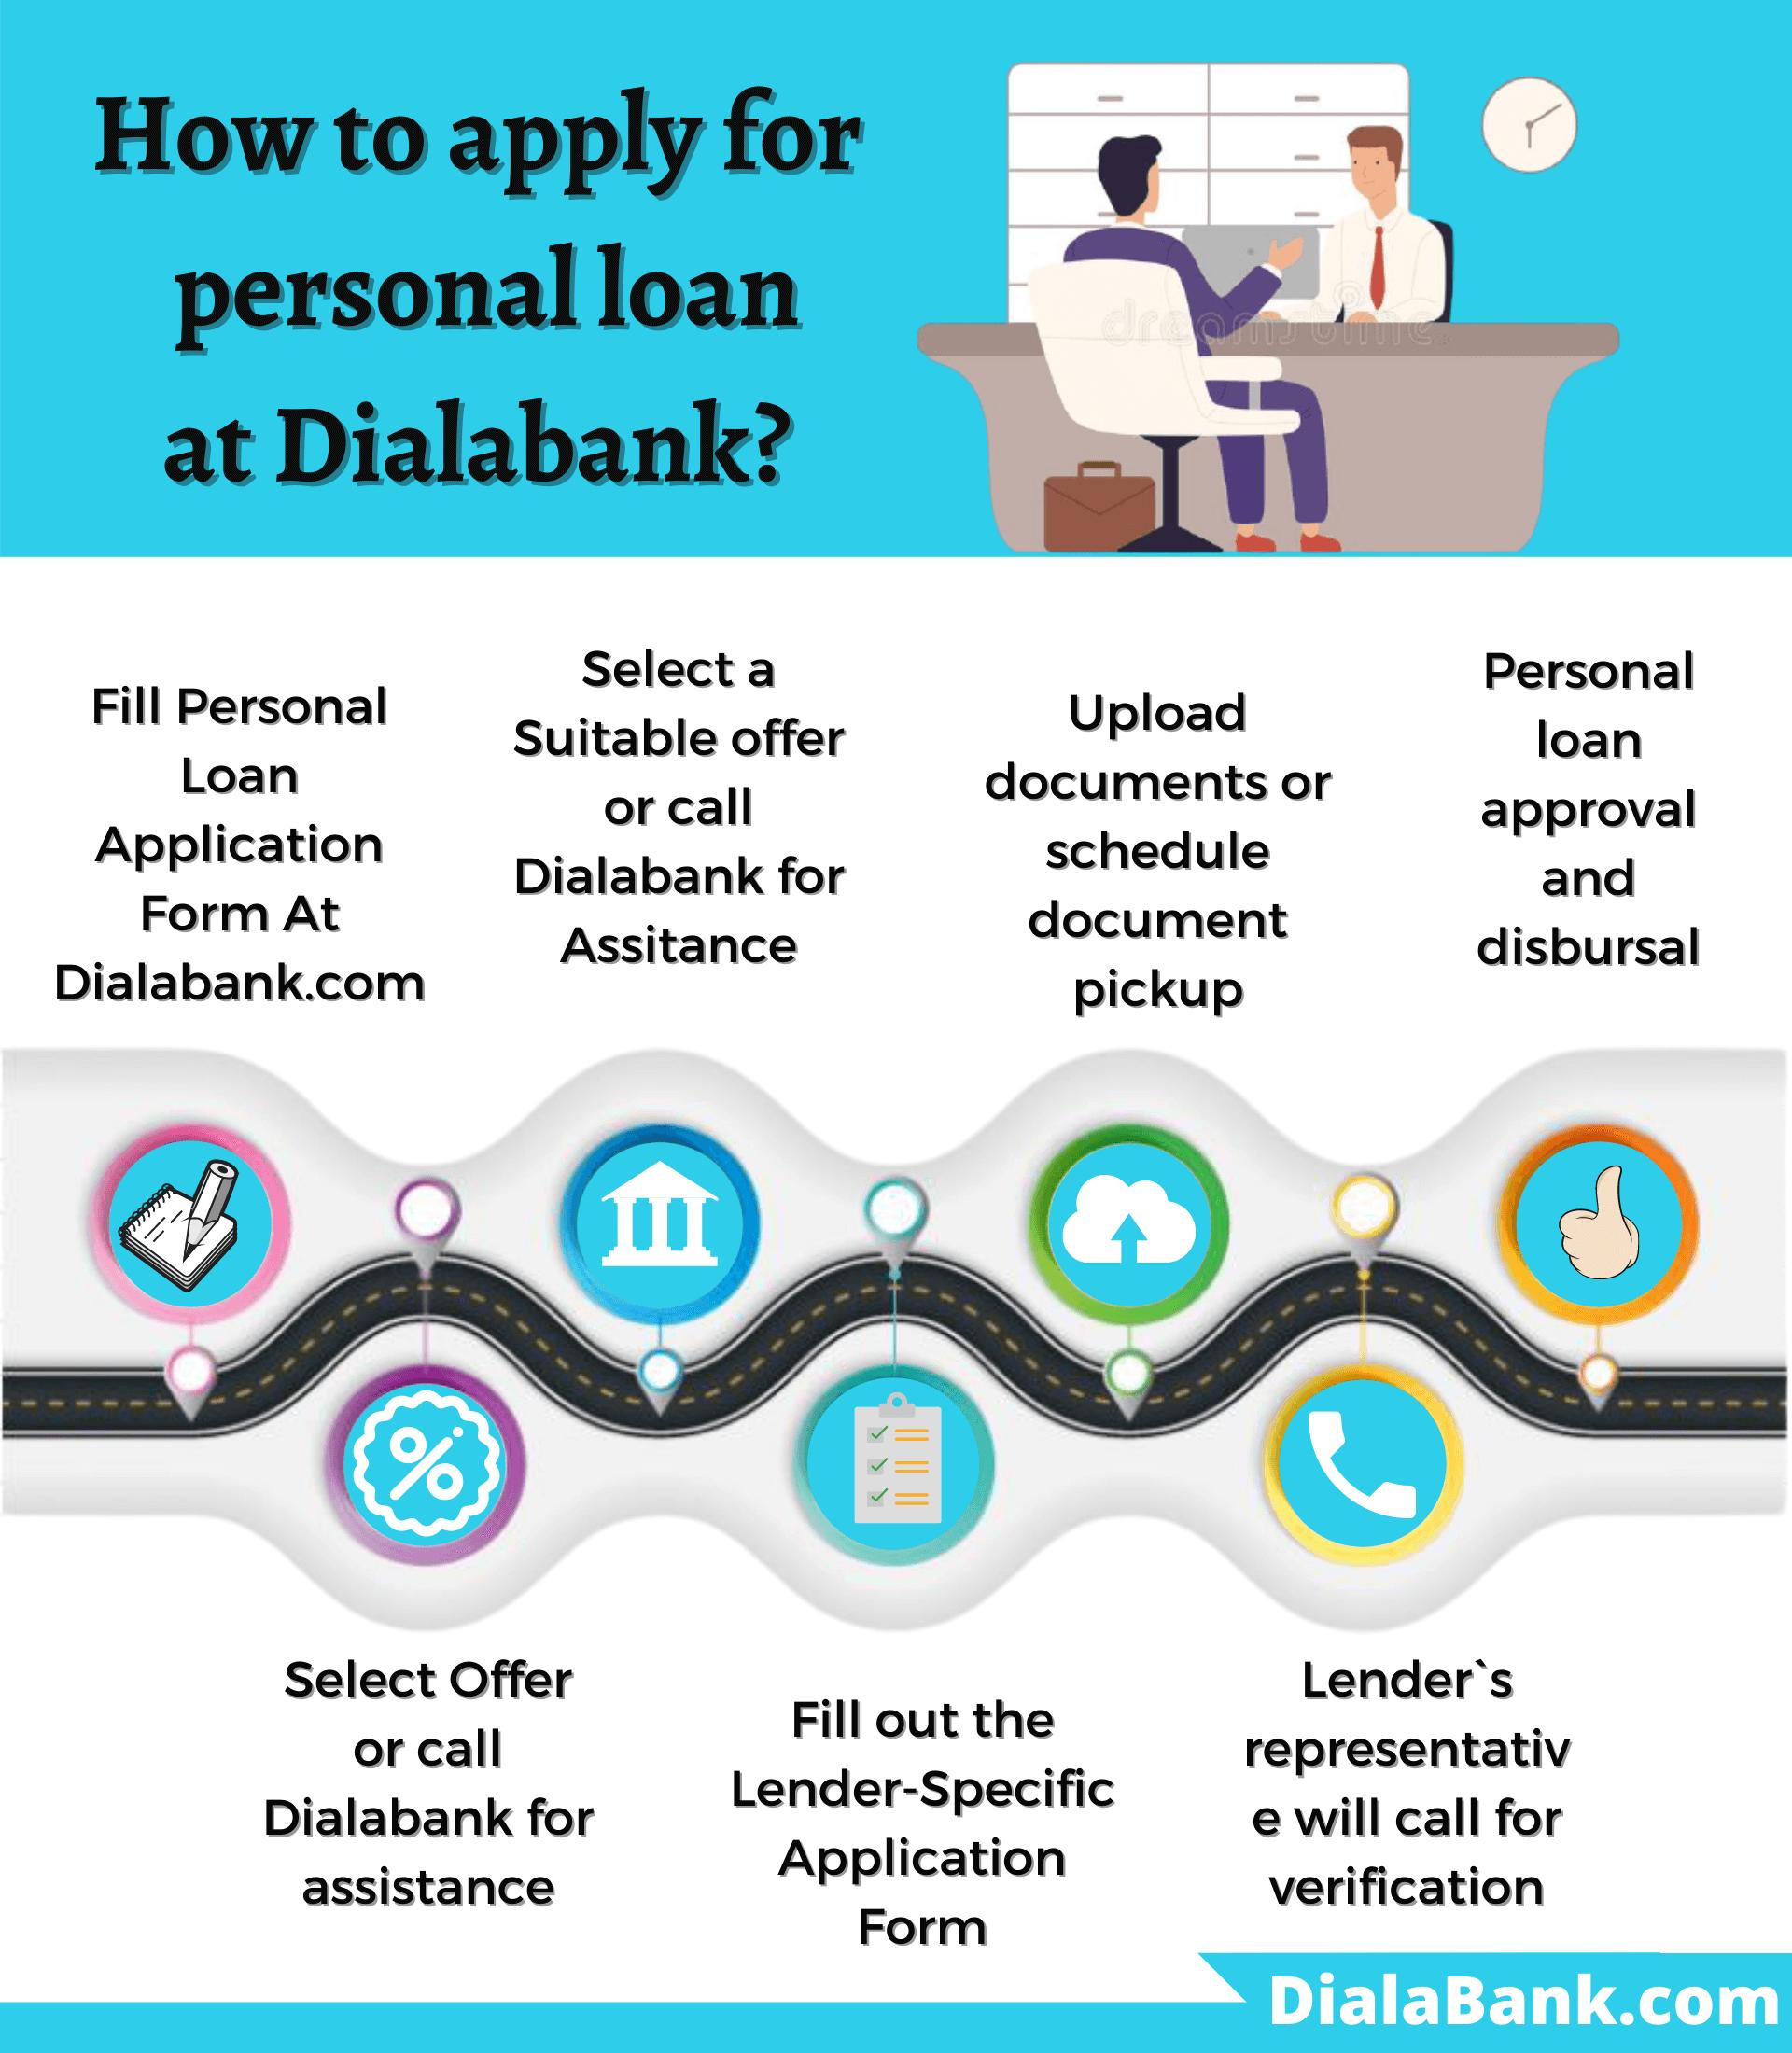 Prathama Bank Personal Loan